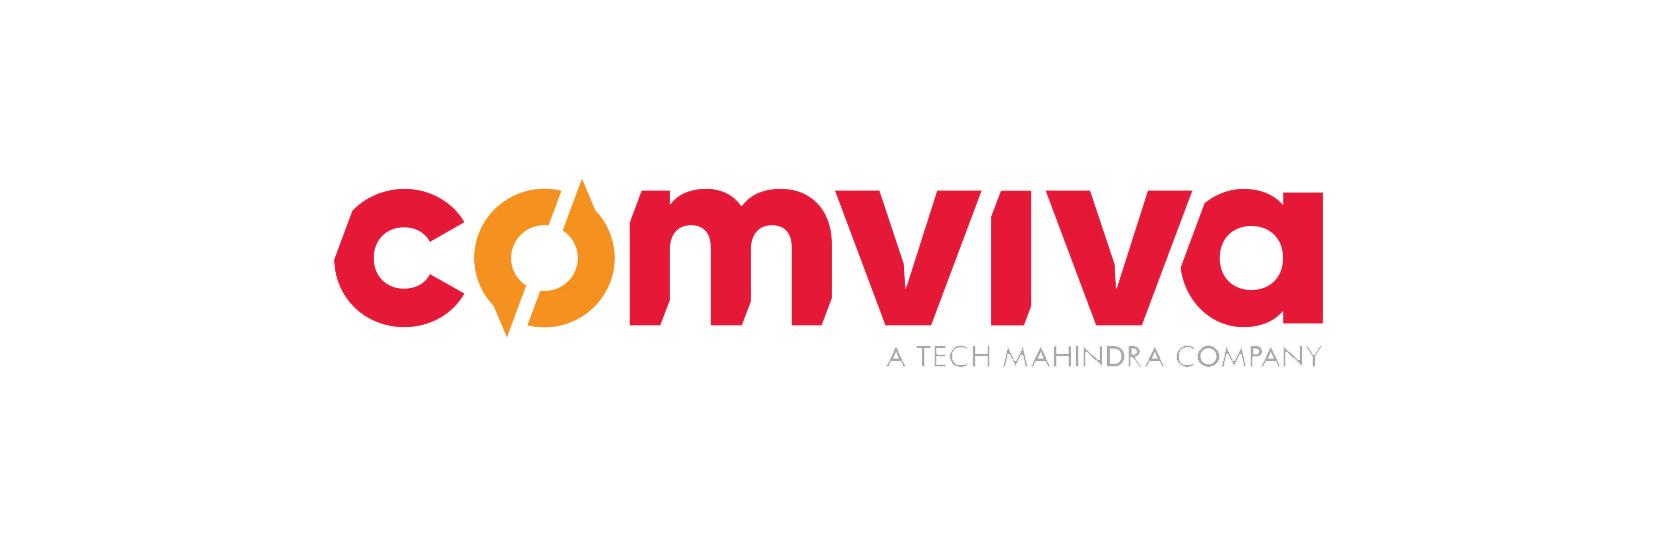 Comviva Wins Four International Awards for mobiquity® – COVID-19 Response